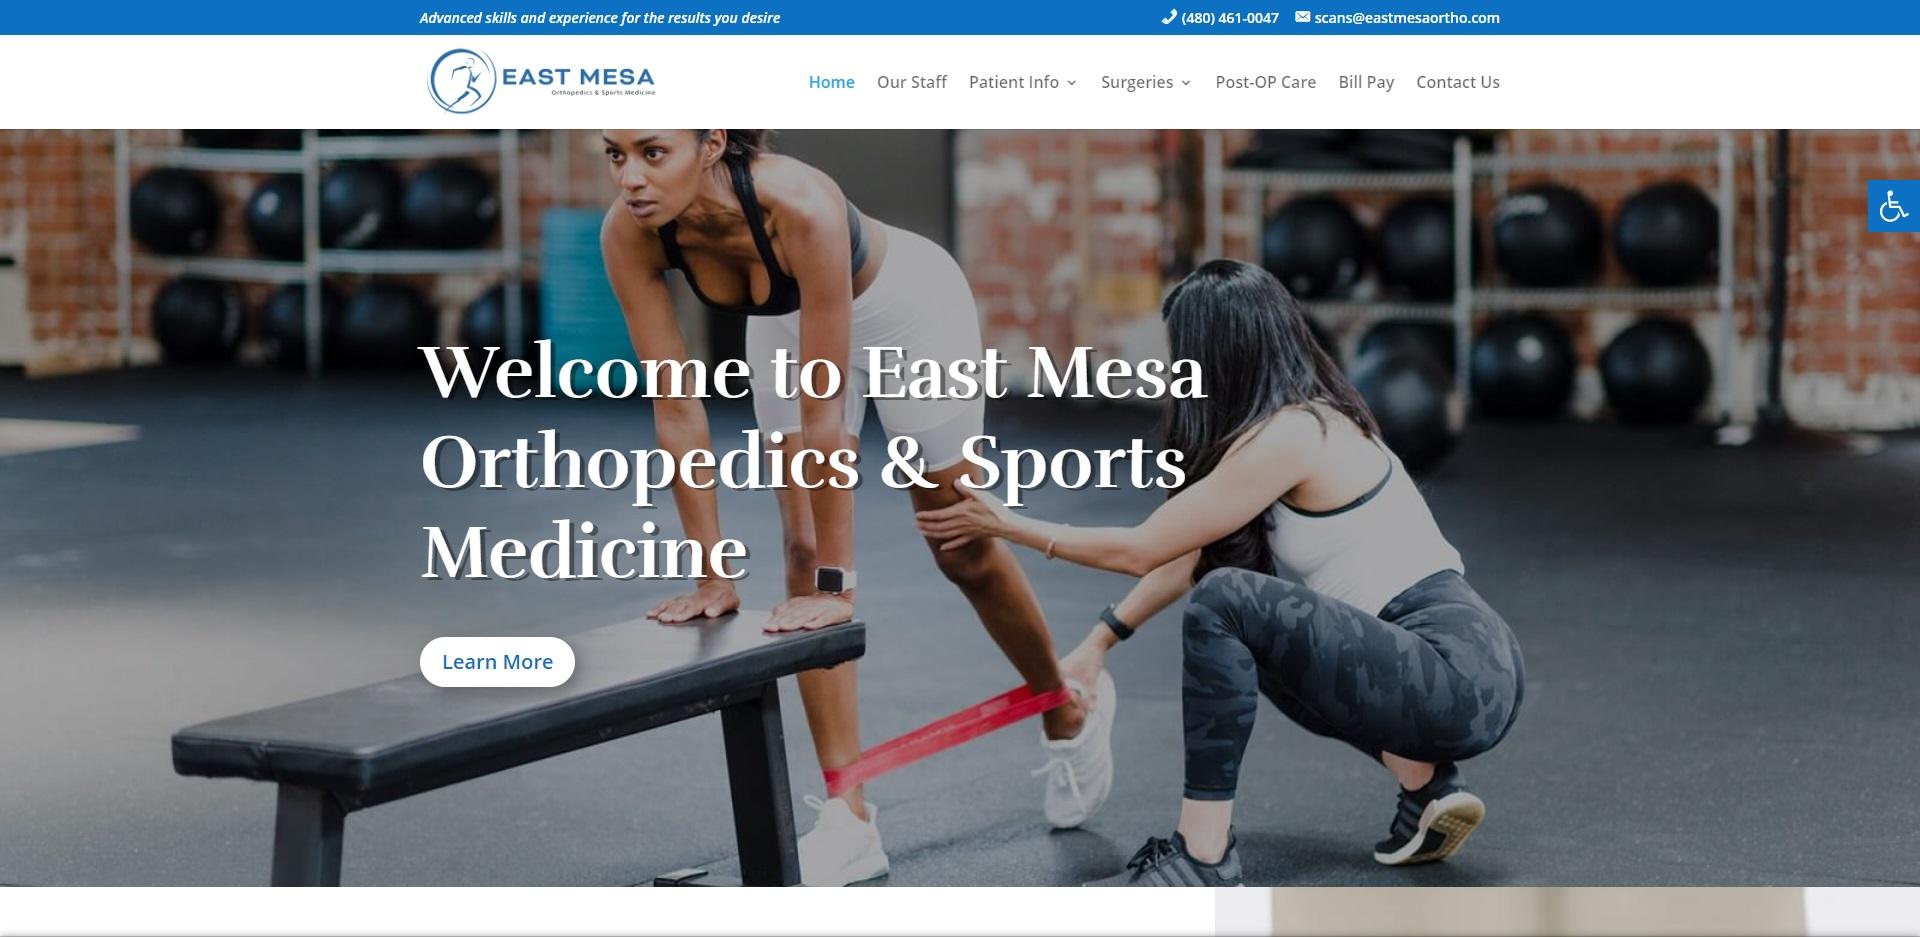 The Best Orthopediatrician in Mesa, AZ